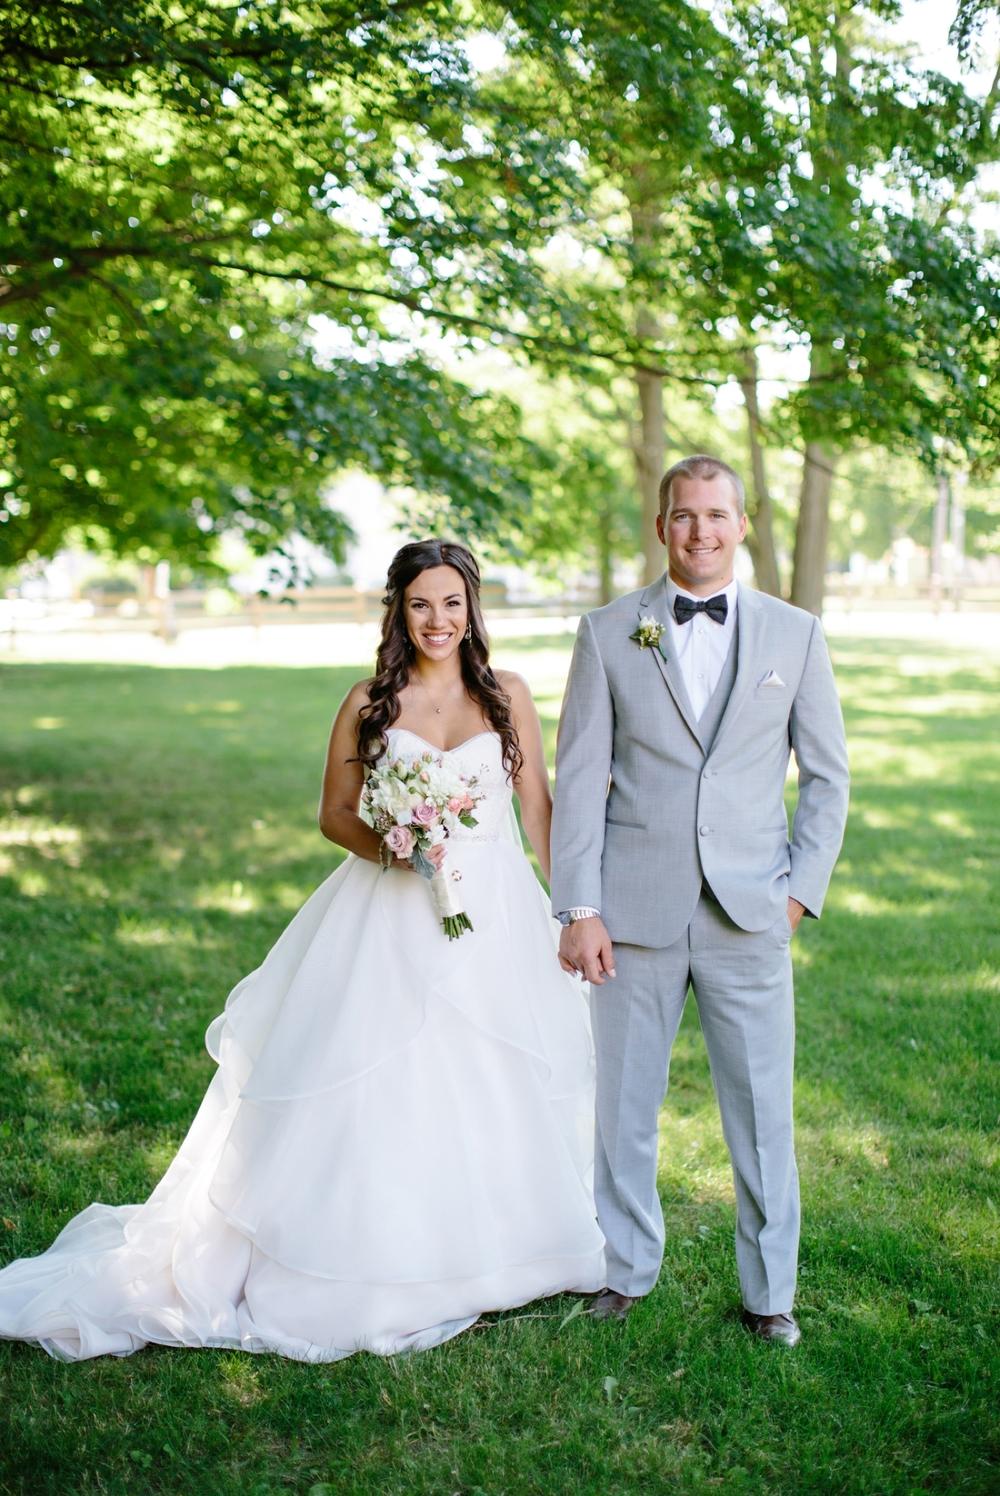 Ottawa Wedding Photography Prince Edward County Wedding Photography  74.jpg